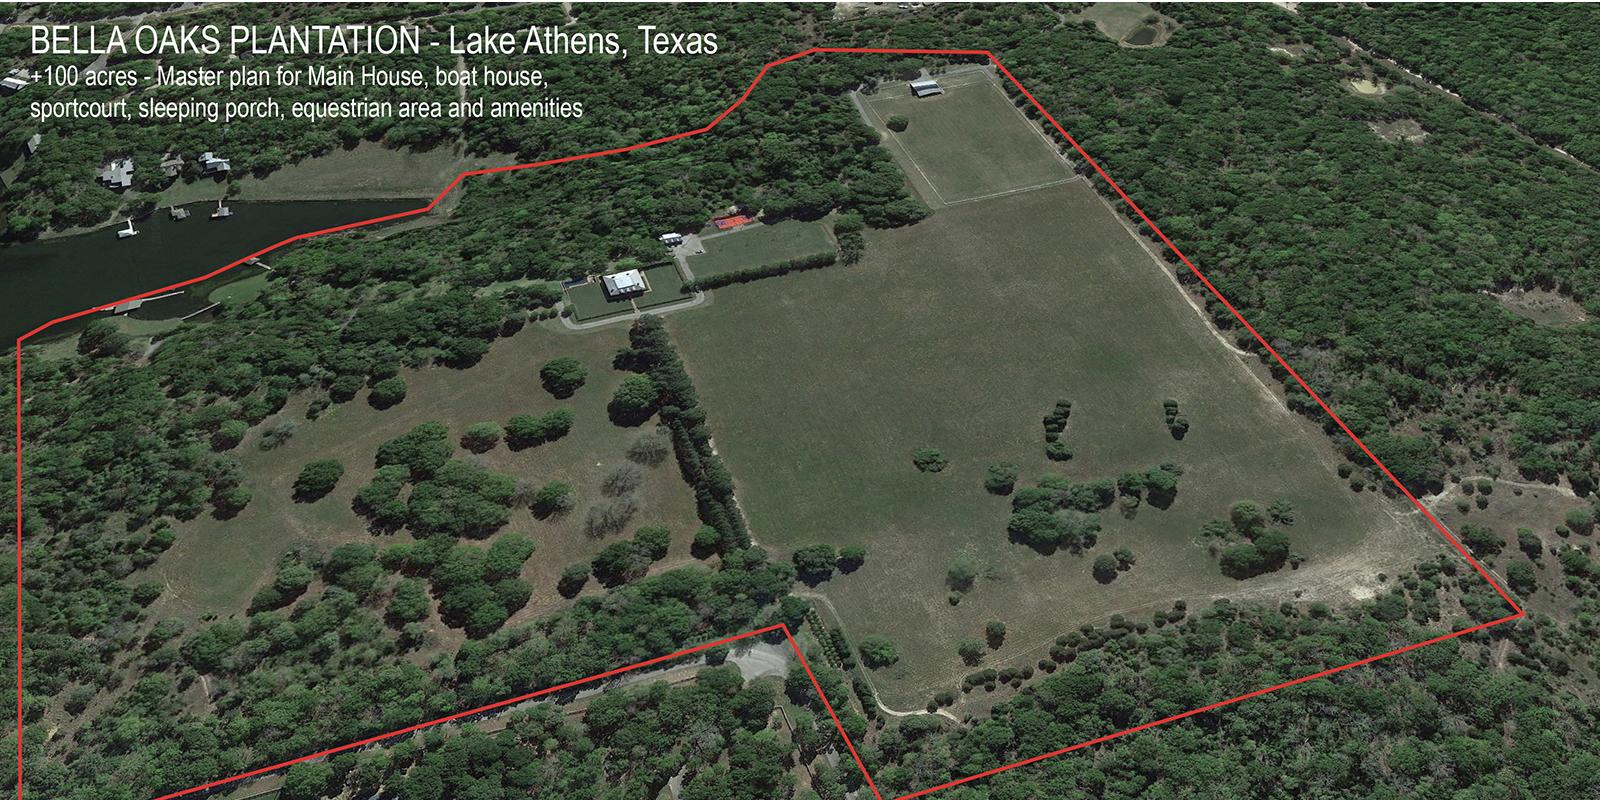 bella oaks plantation_aerial image.jpg